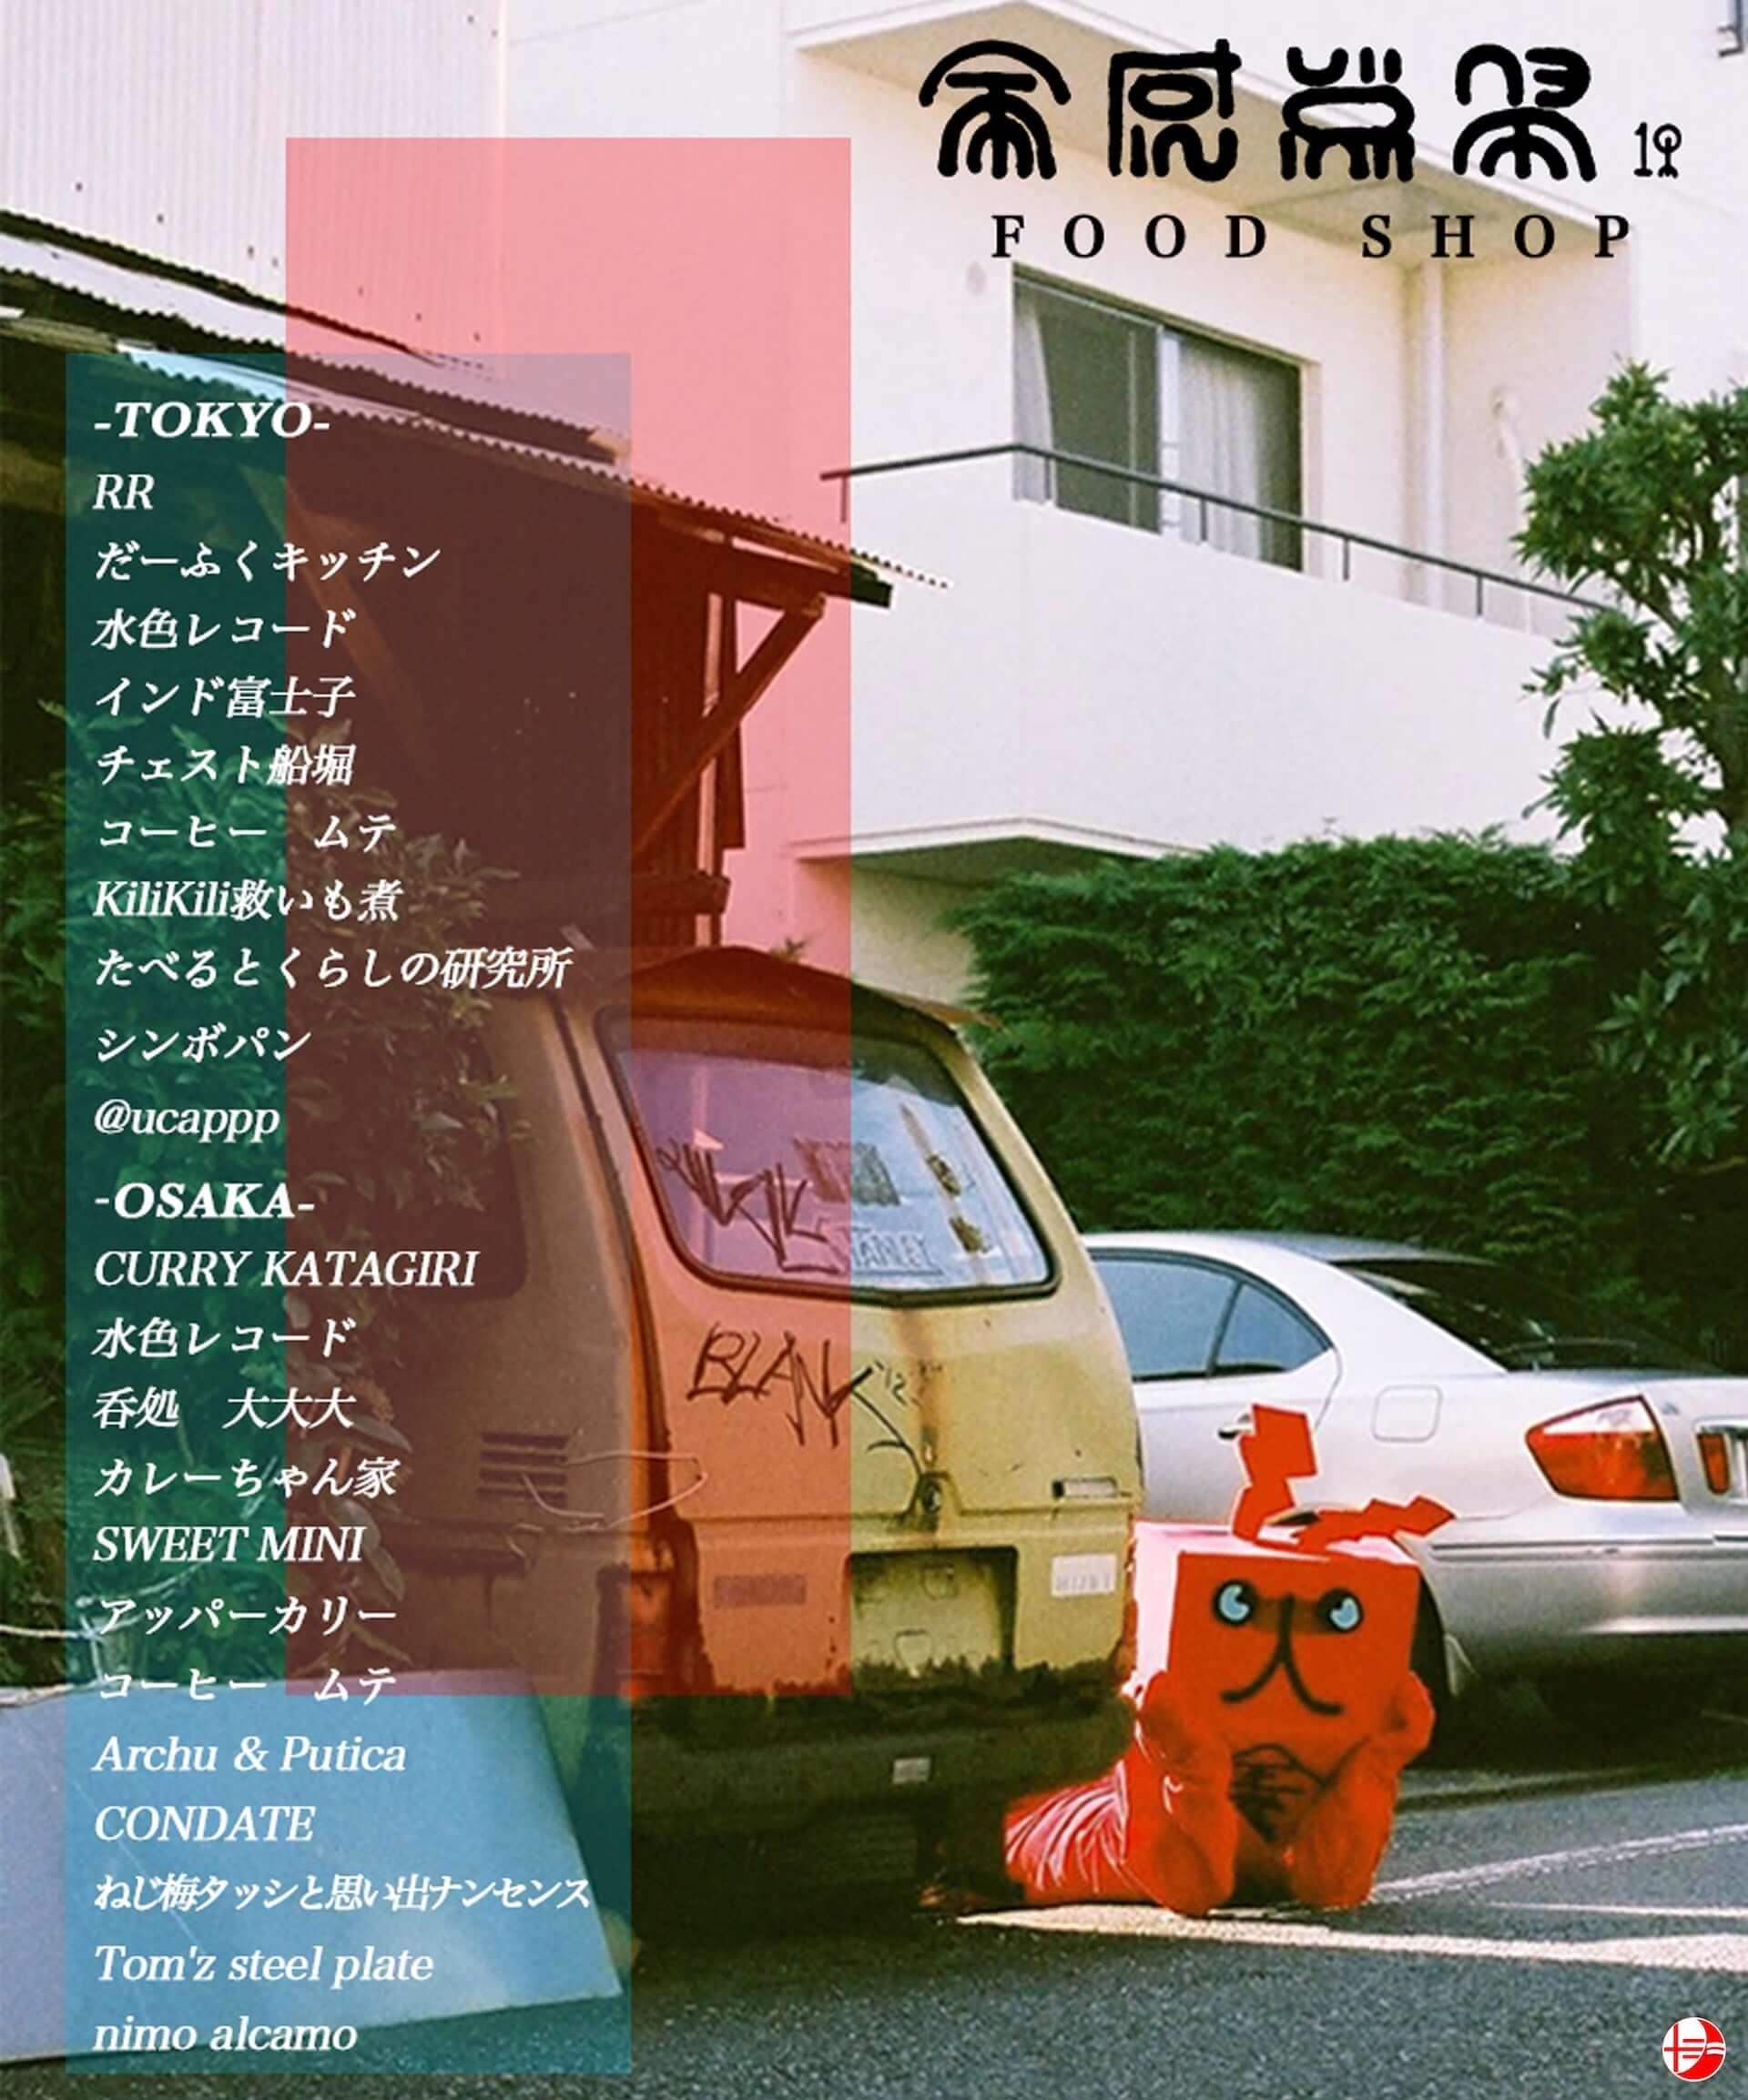 Tohji、STUTS、幾何学模様、Jin Doggが登場|<全感覚祭>第2弾アーティスト&フード発表 music190830_zenkankakufes_1-1920x2307